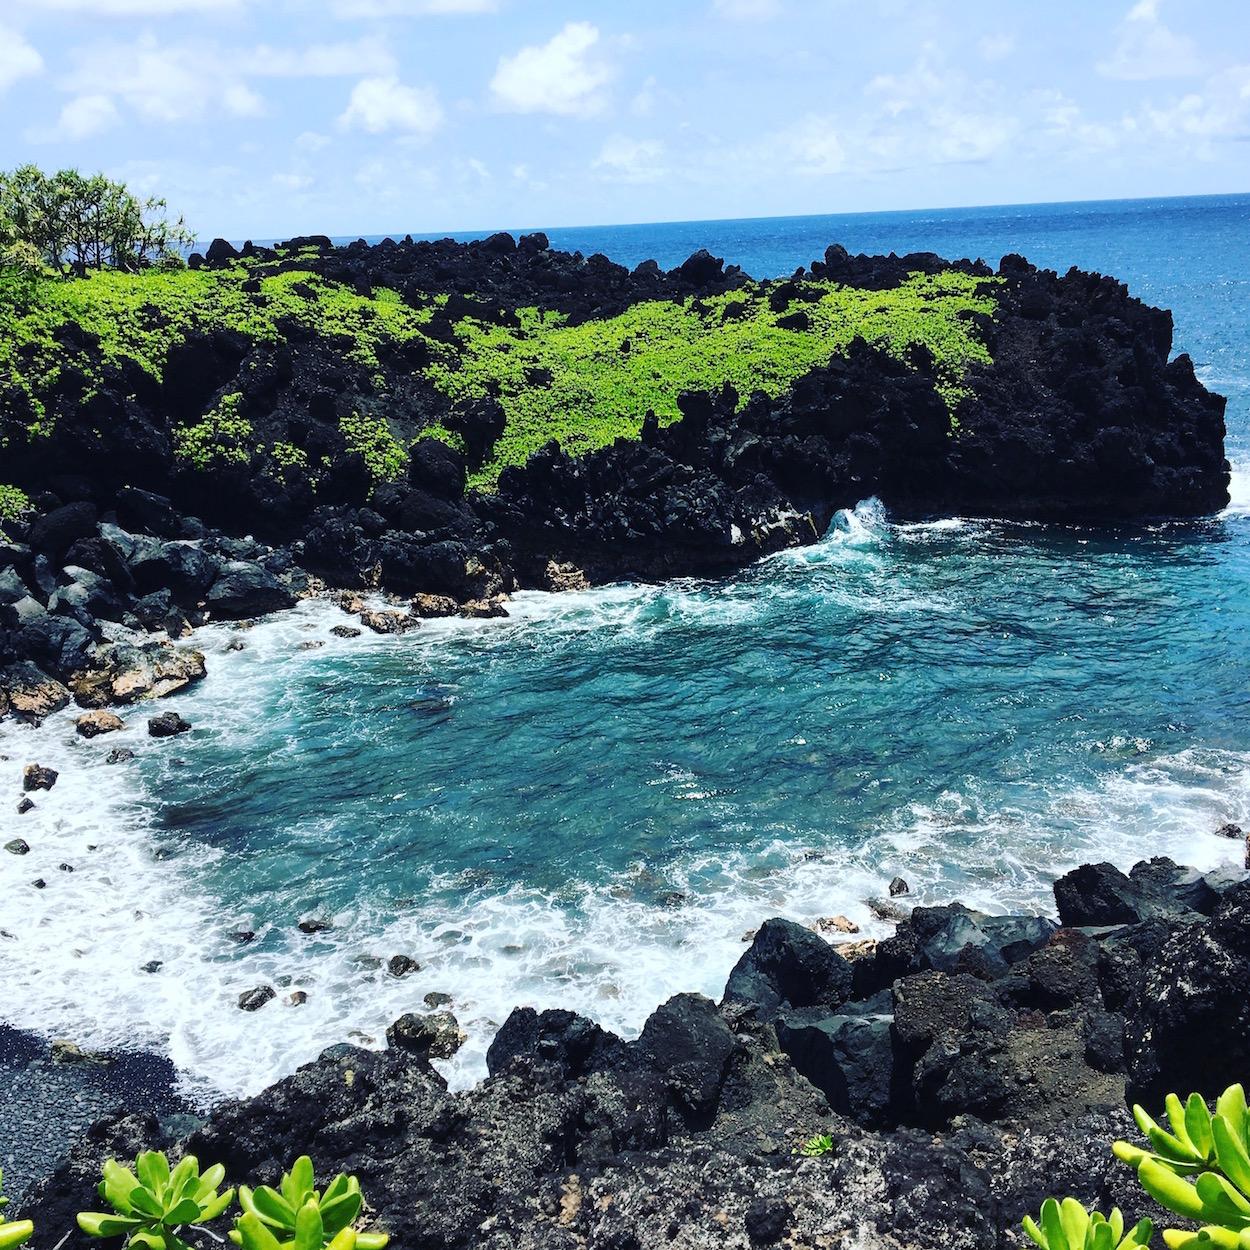 https://www.travelersjoy.com/blog/Road_to_Hana_Maui_Waianapanapa_State_Park.jpg